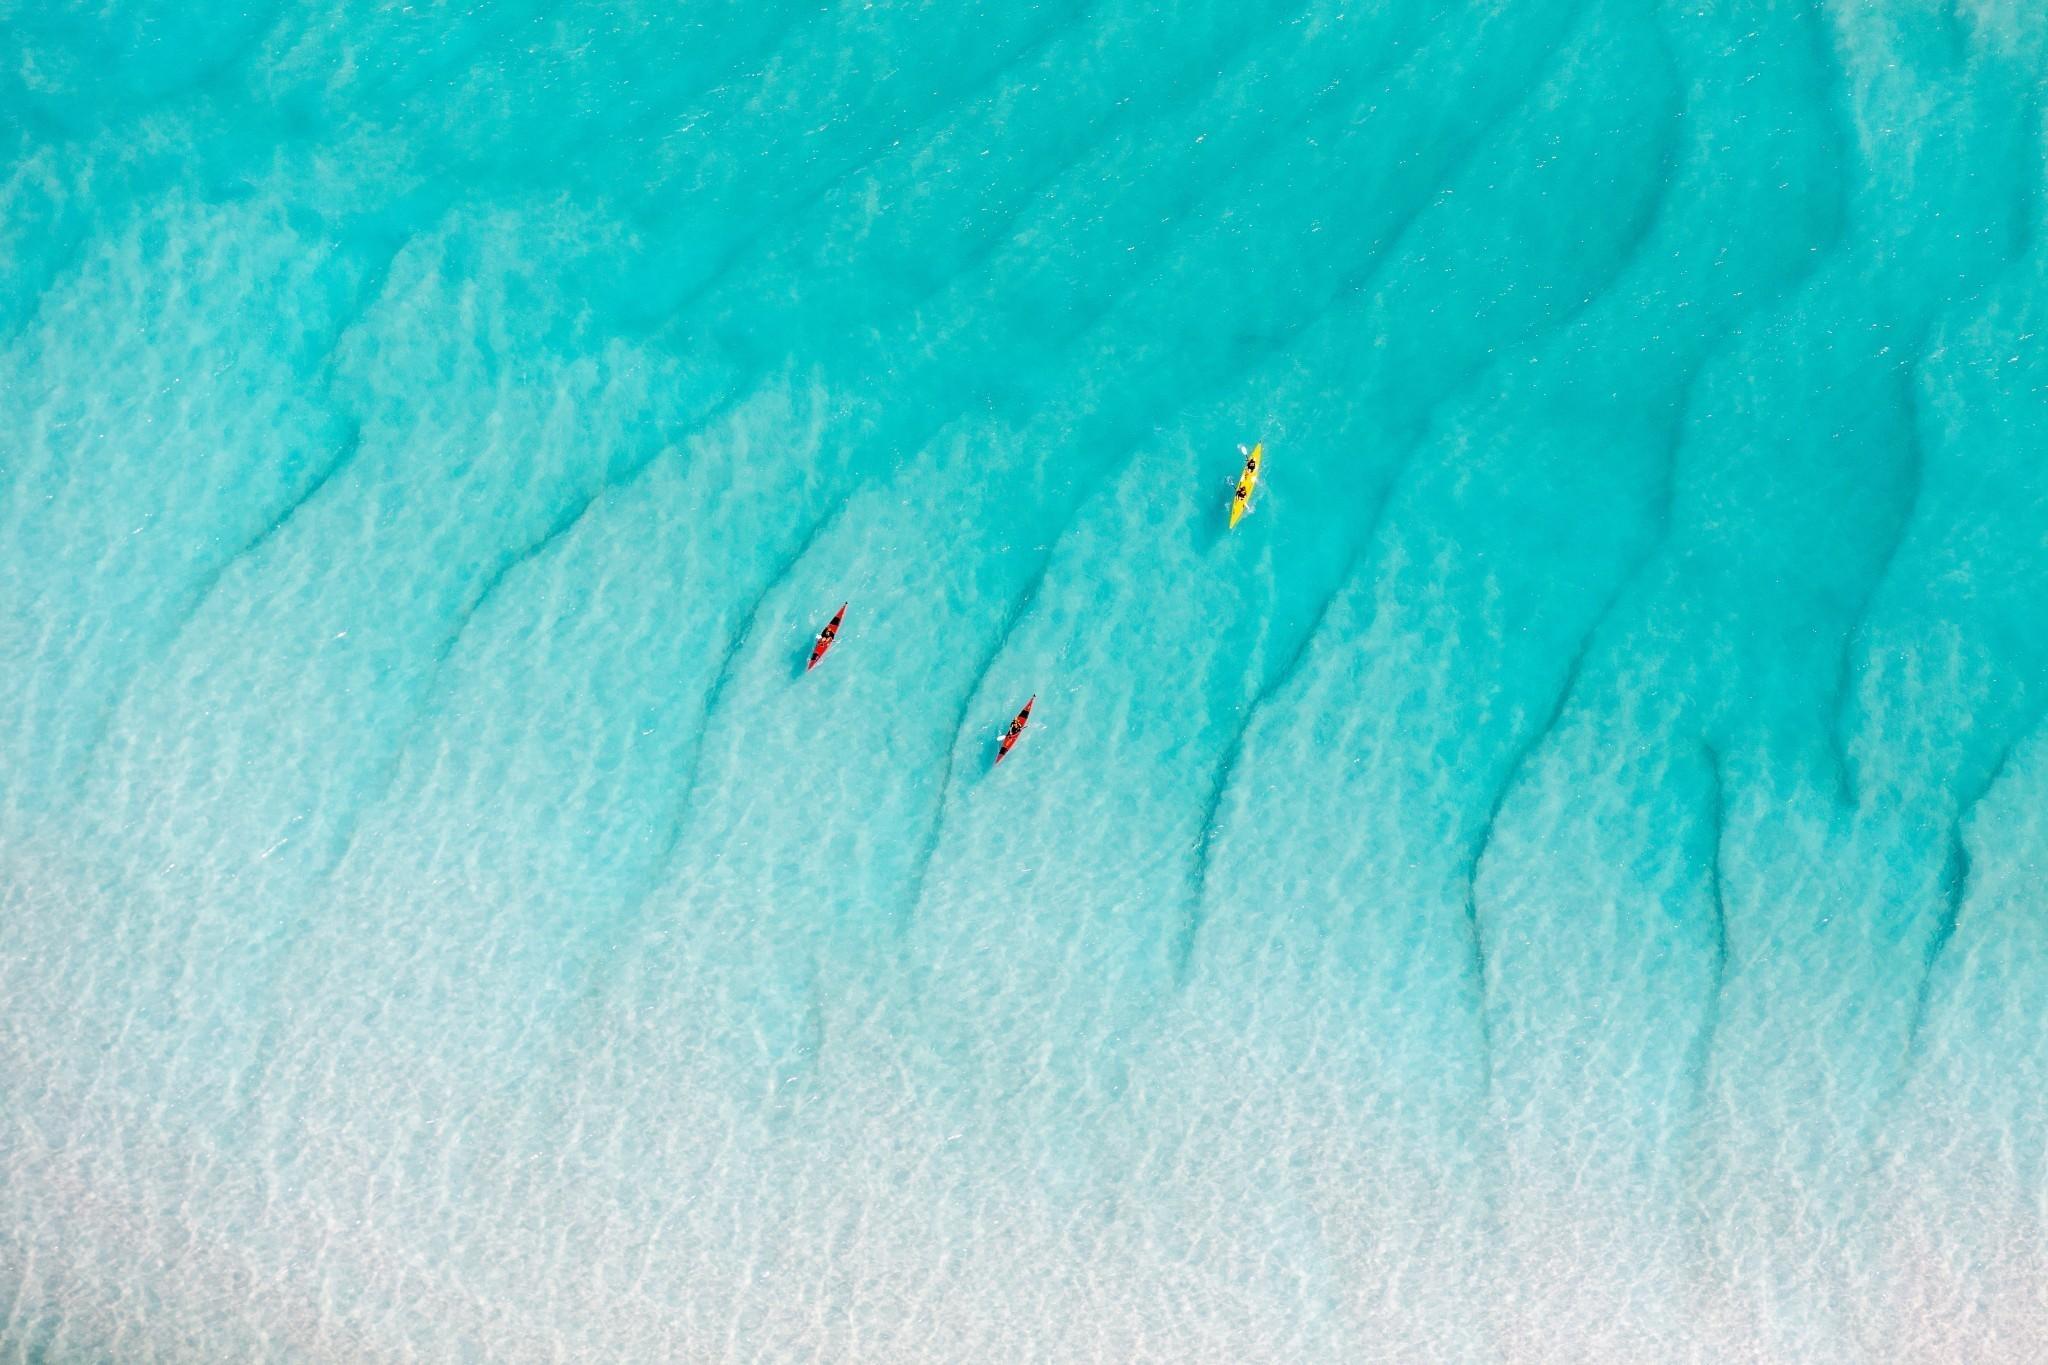 Kayaking at Whitehaven Beach, Whitsundays Islands, QLD